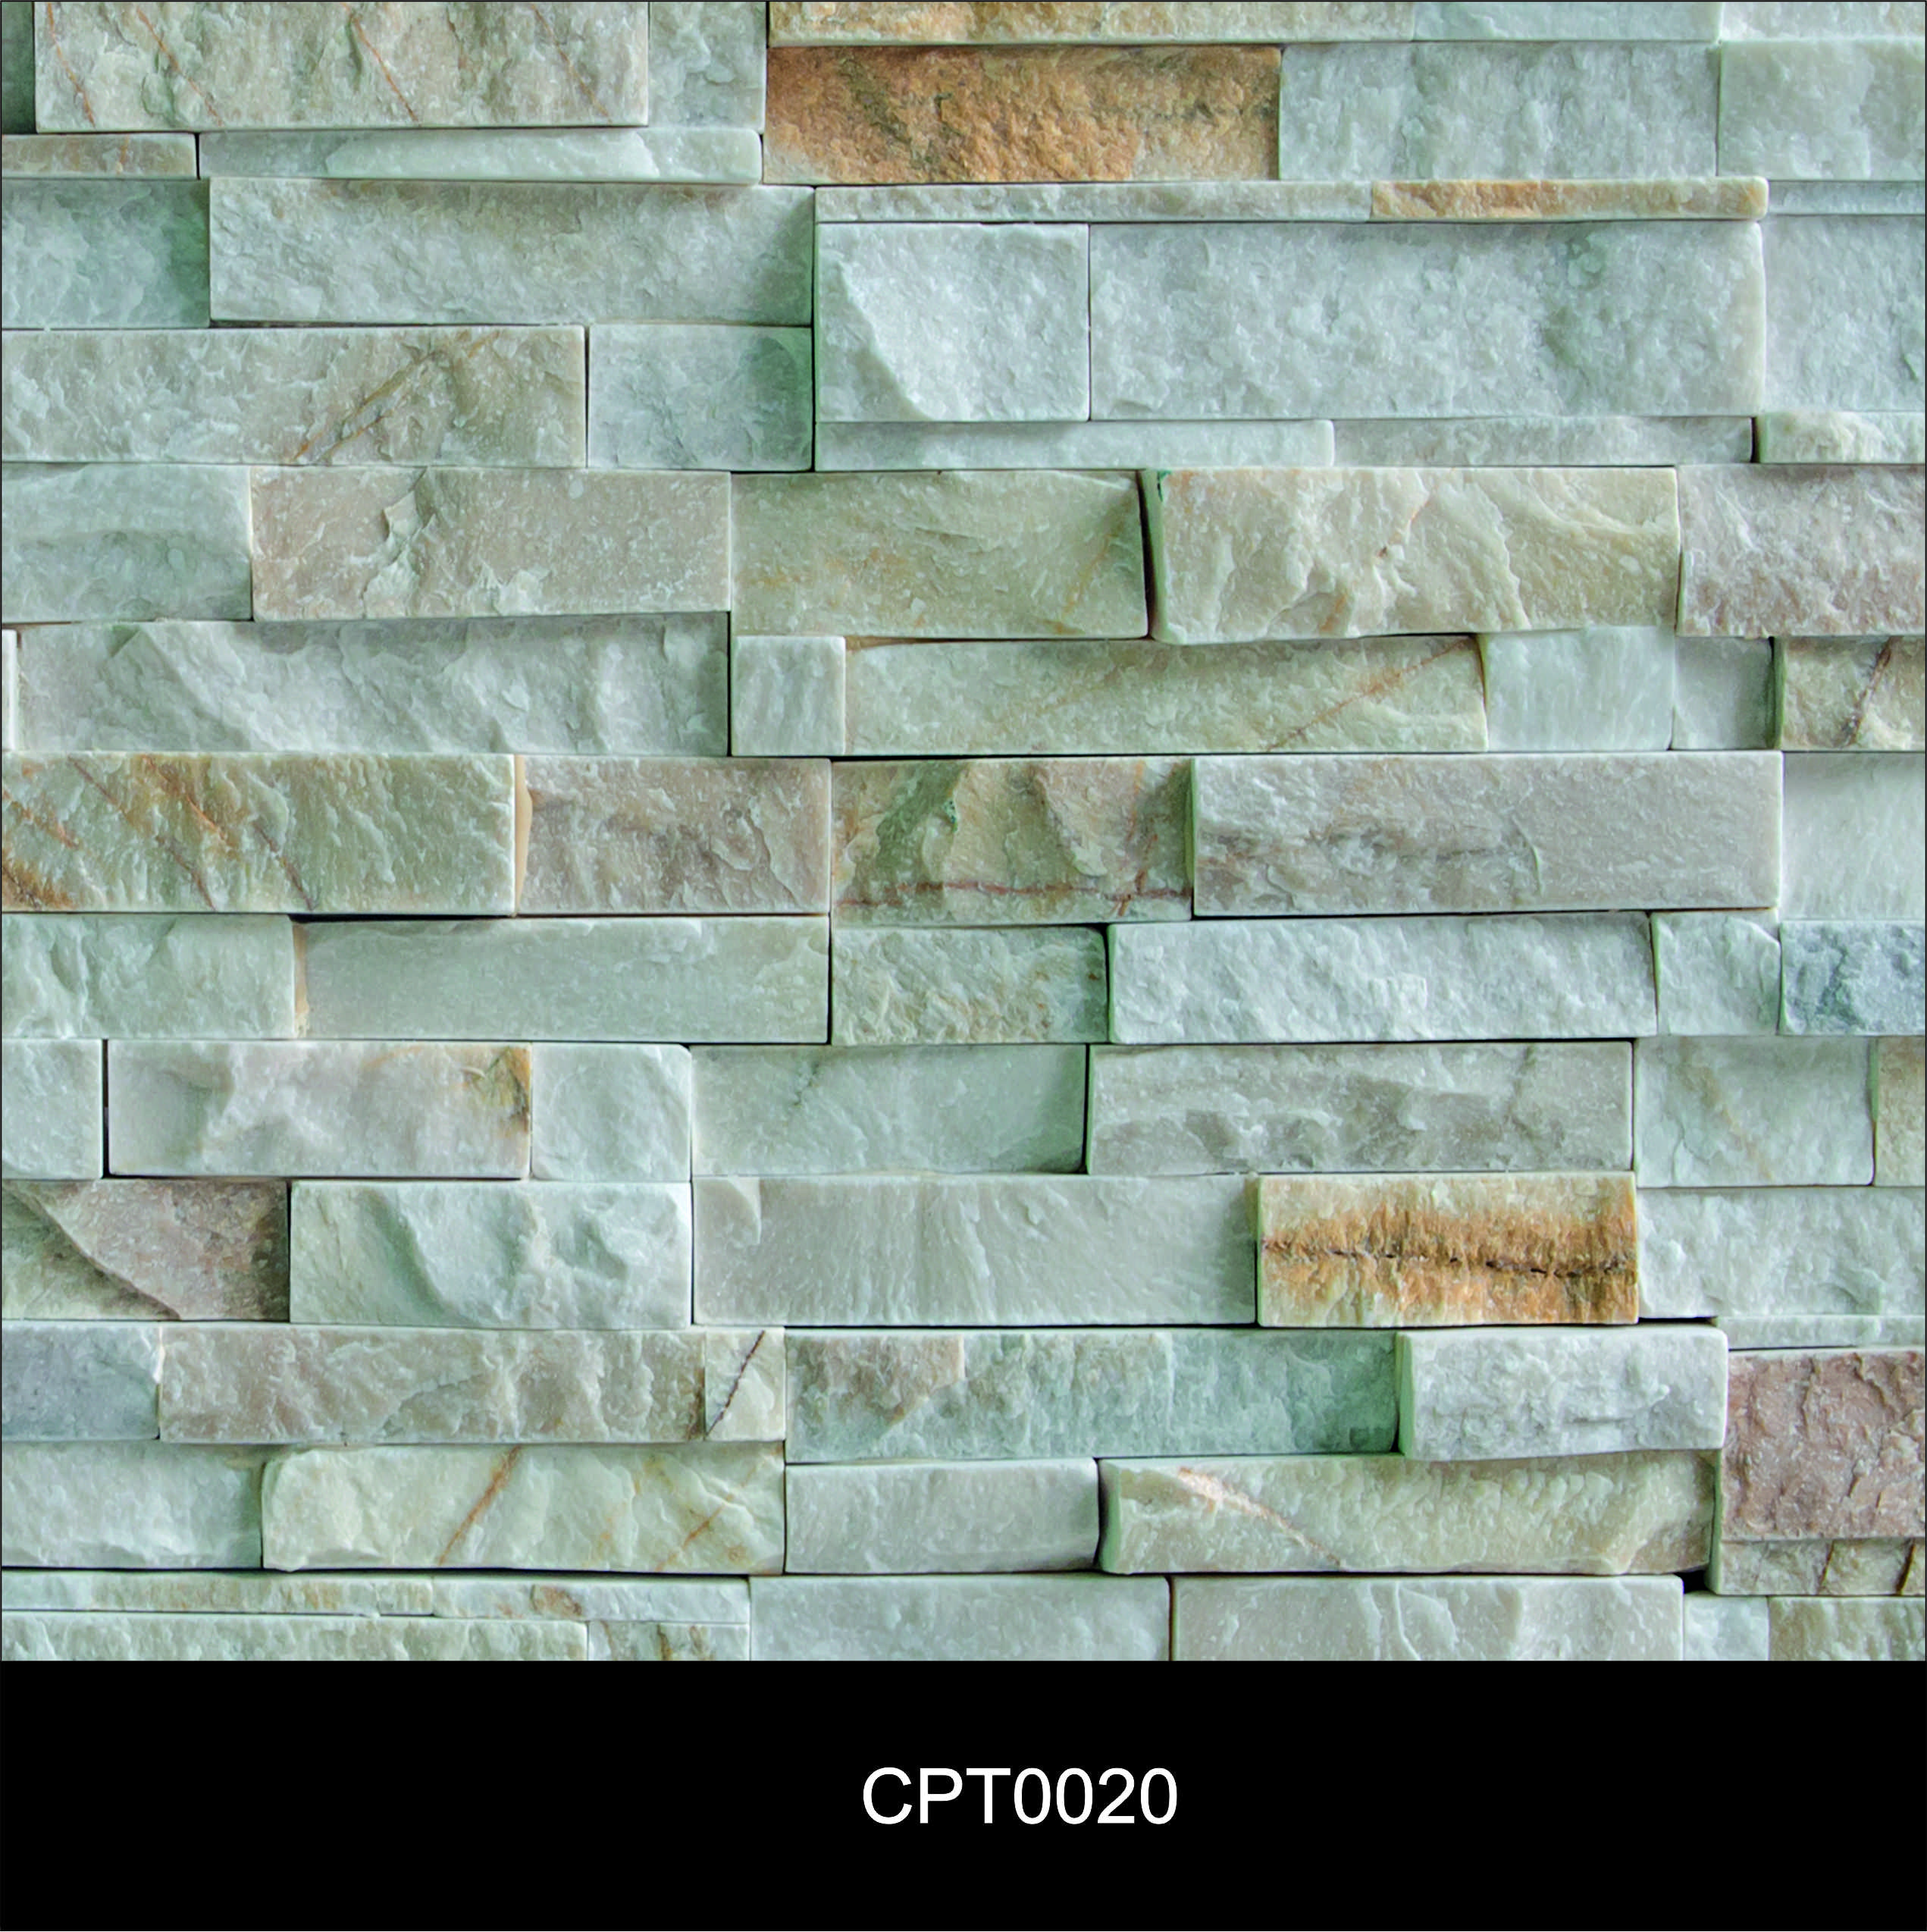 Papel de parede canjiquinha 3d 0020 final decor elo7 - Papel pared 3d ...